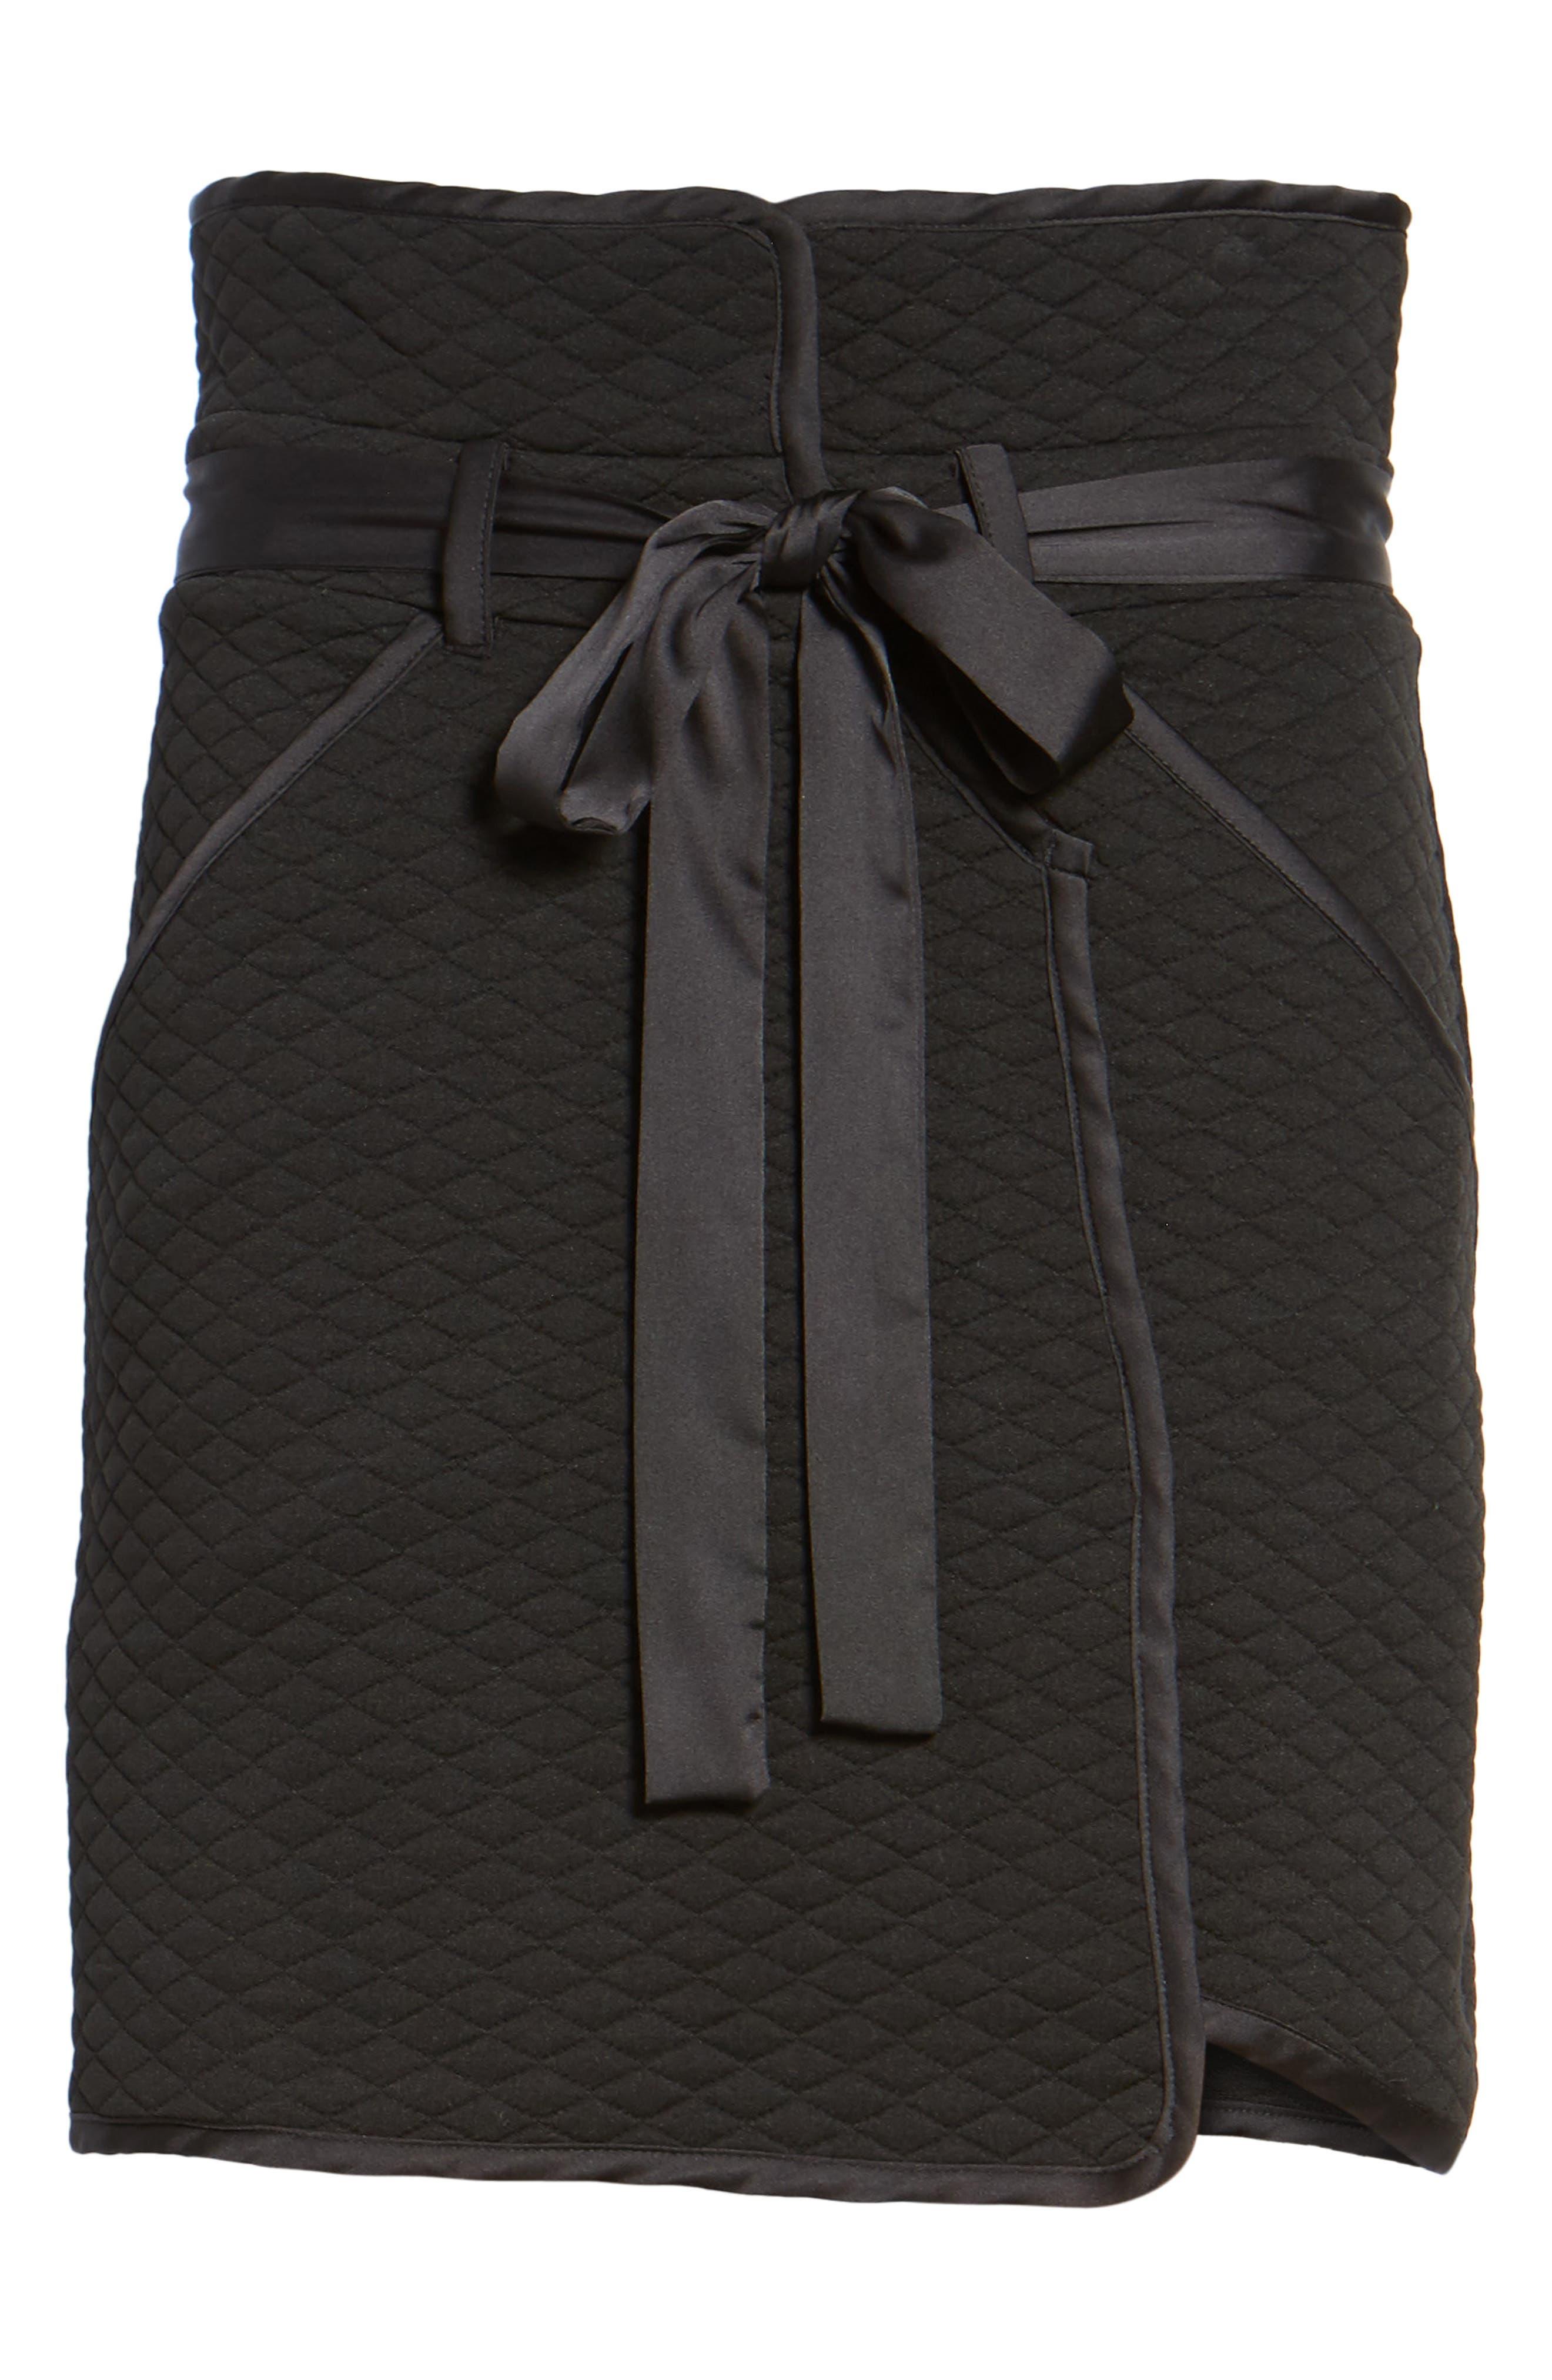 Andi Miniskirt,                             Alternate thumbnail 6, color,